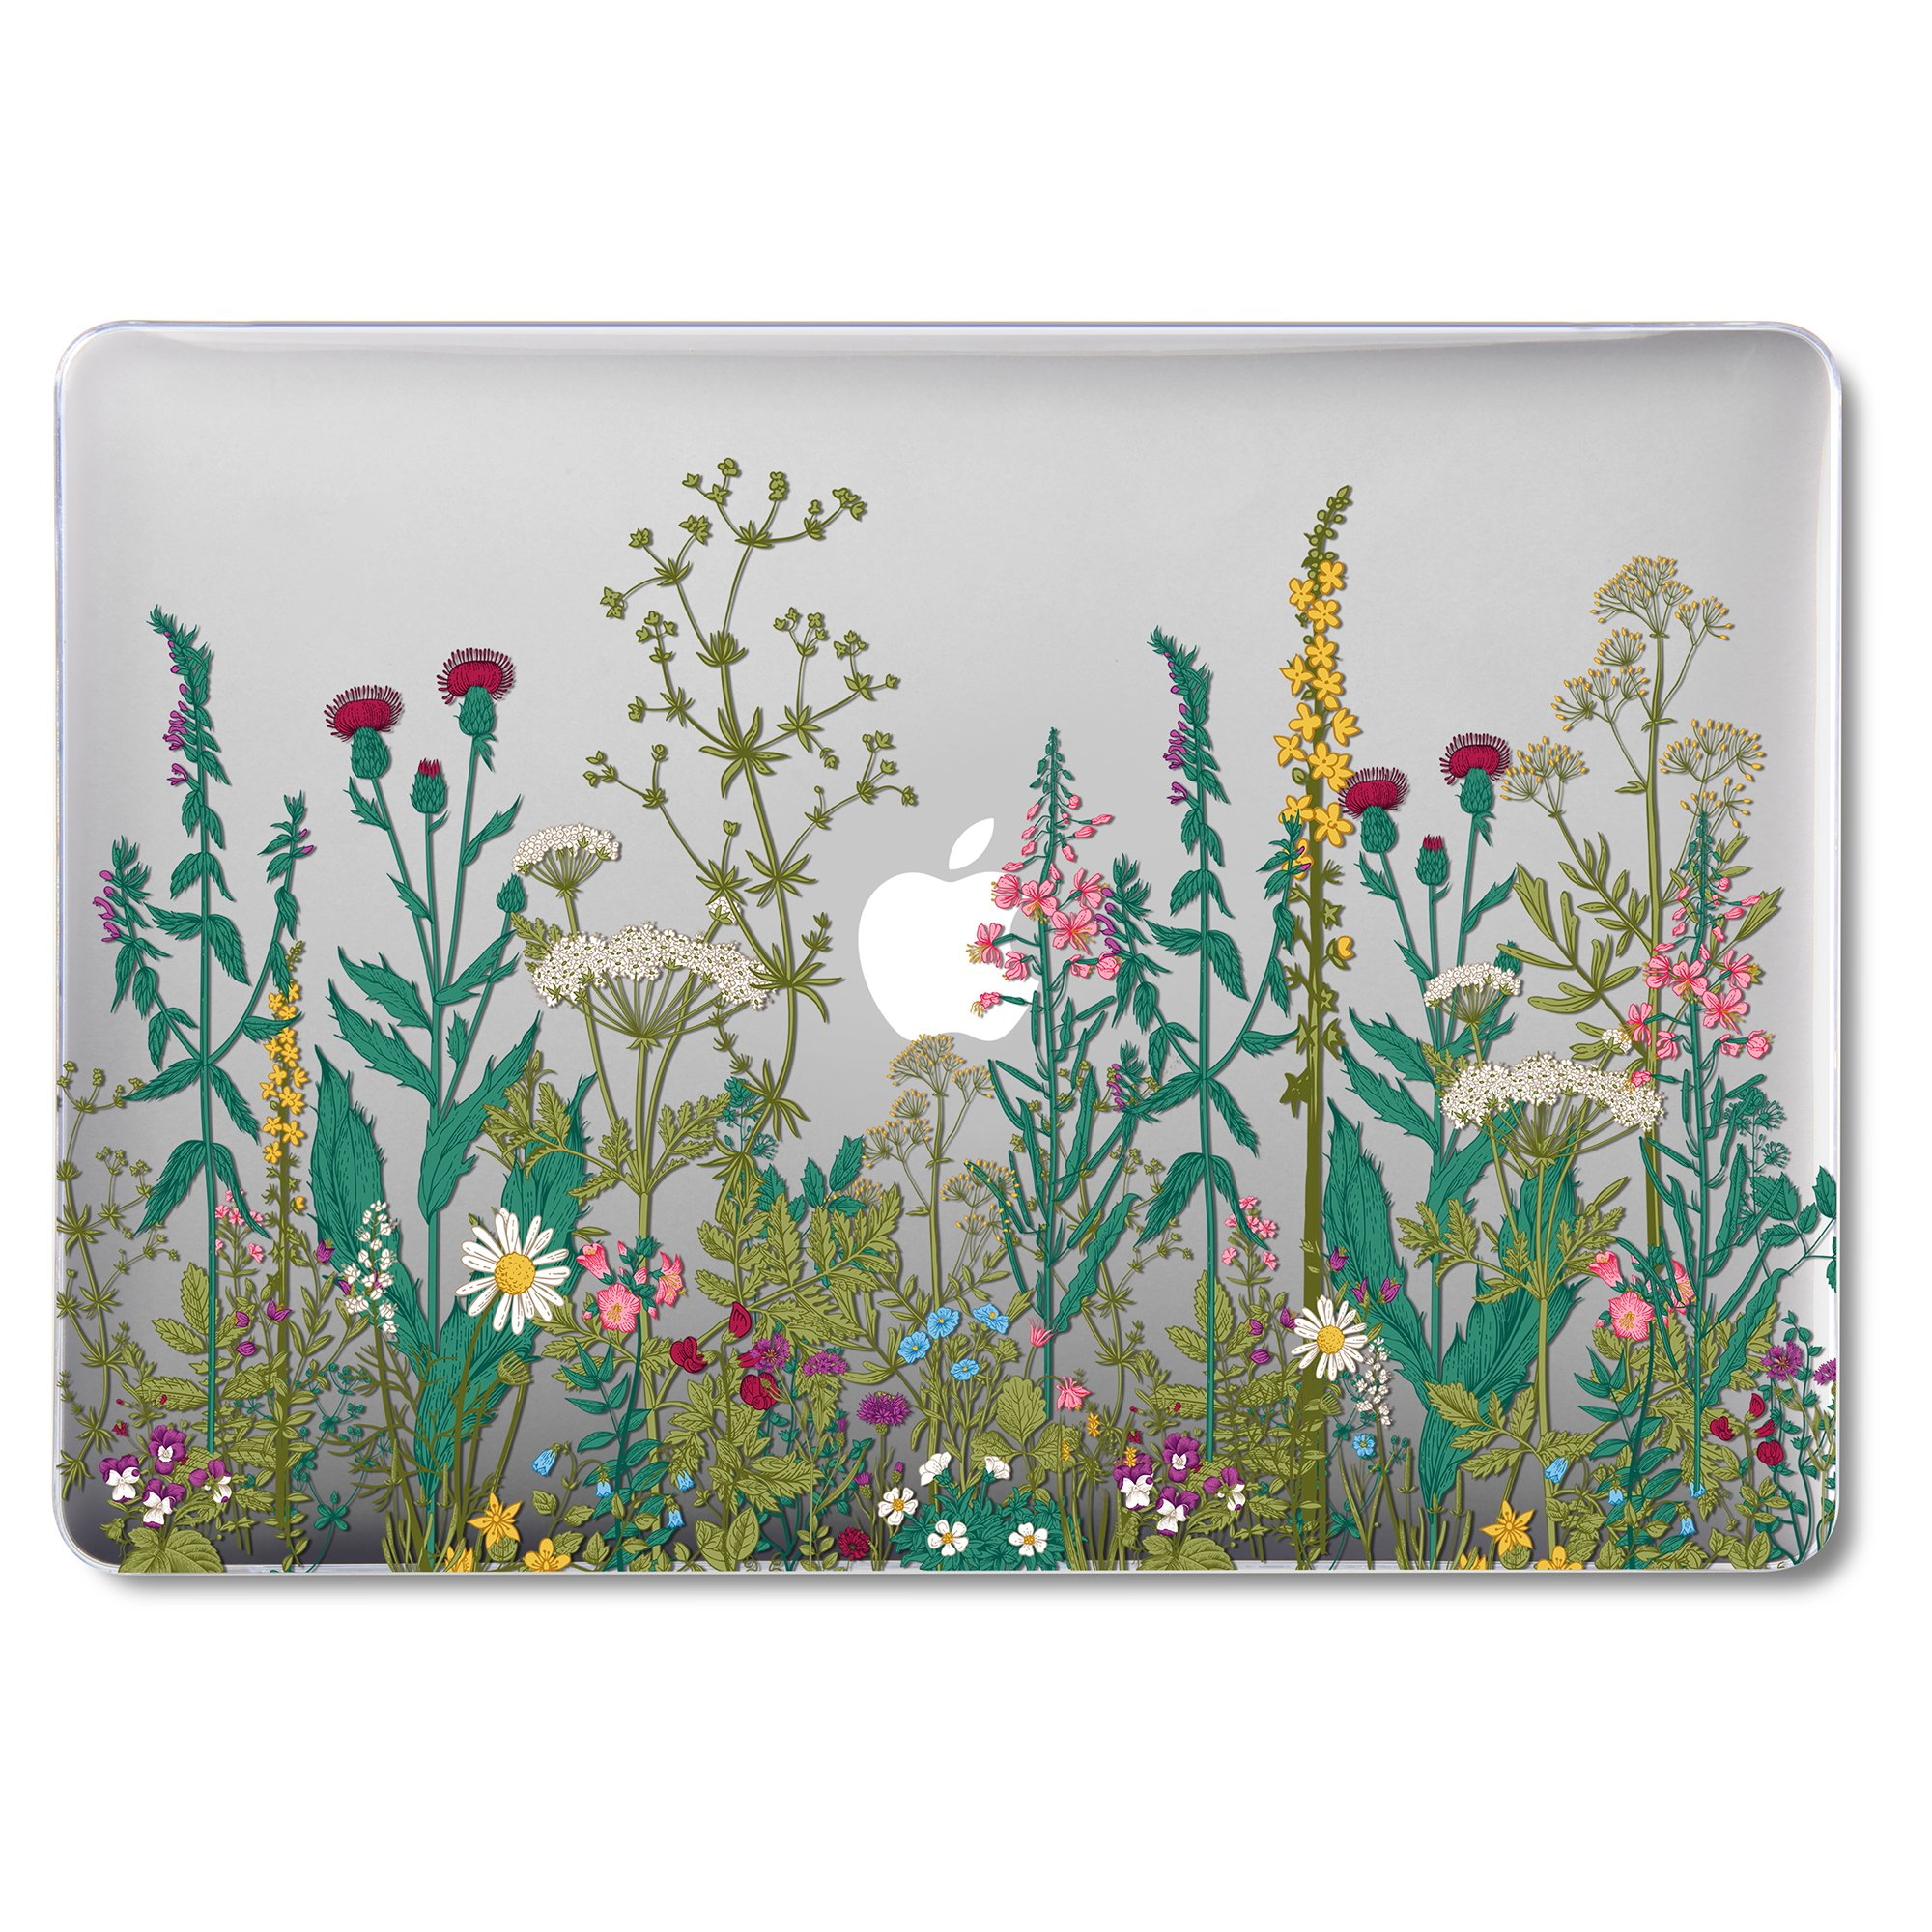 GMYLE MacBook Air 13 Inch Case